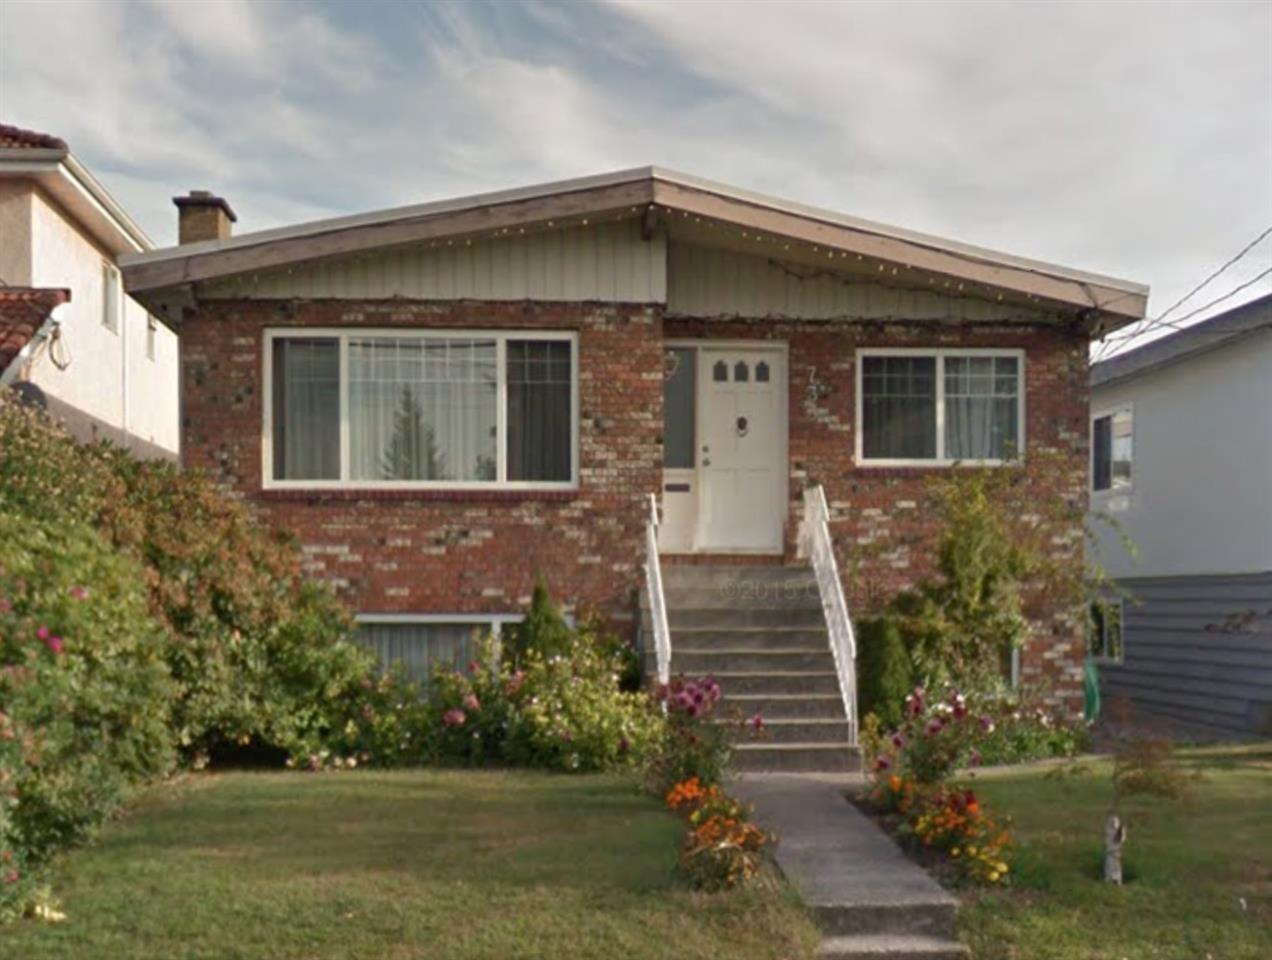 R2131660 - 733 E 54TH AVENUE, South Vancouver, Vancouver, BC - House/Single Family